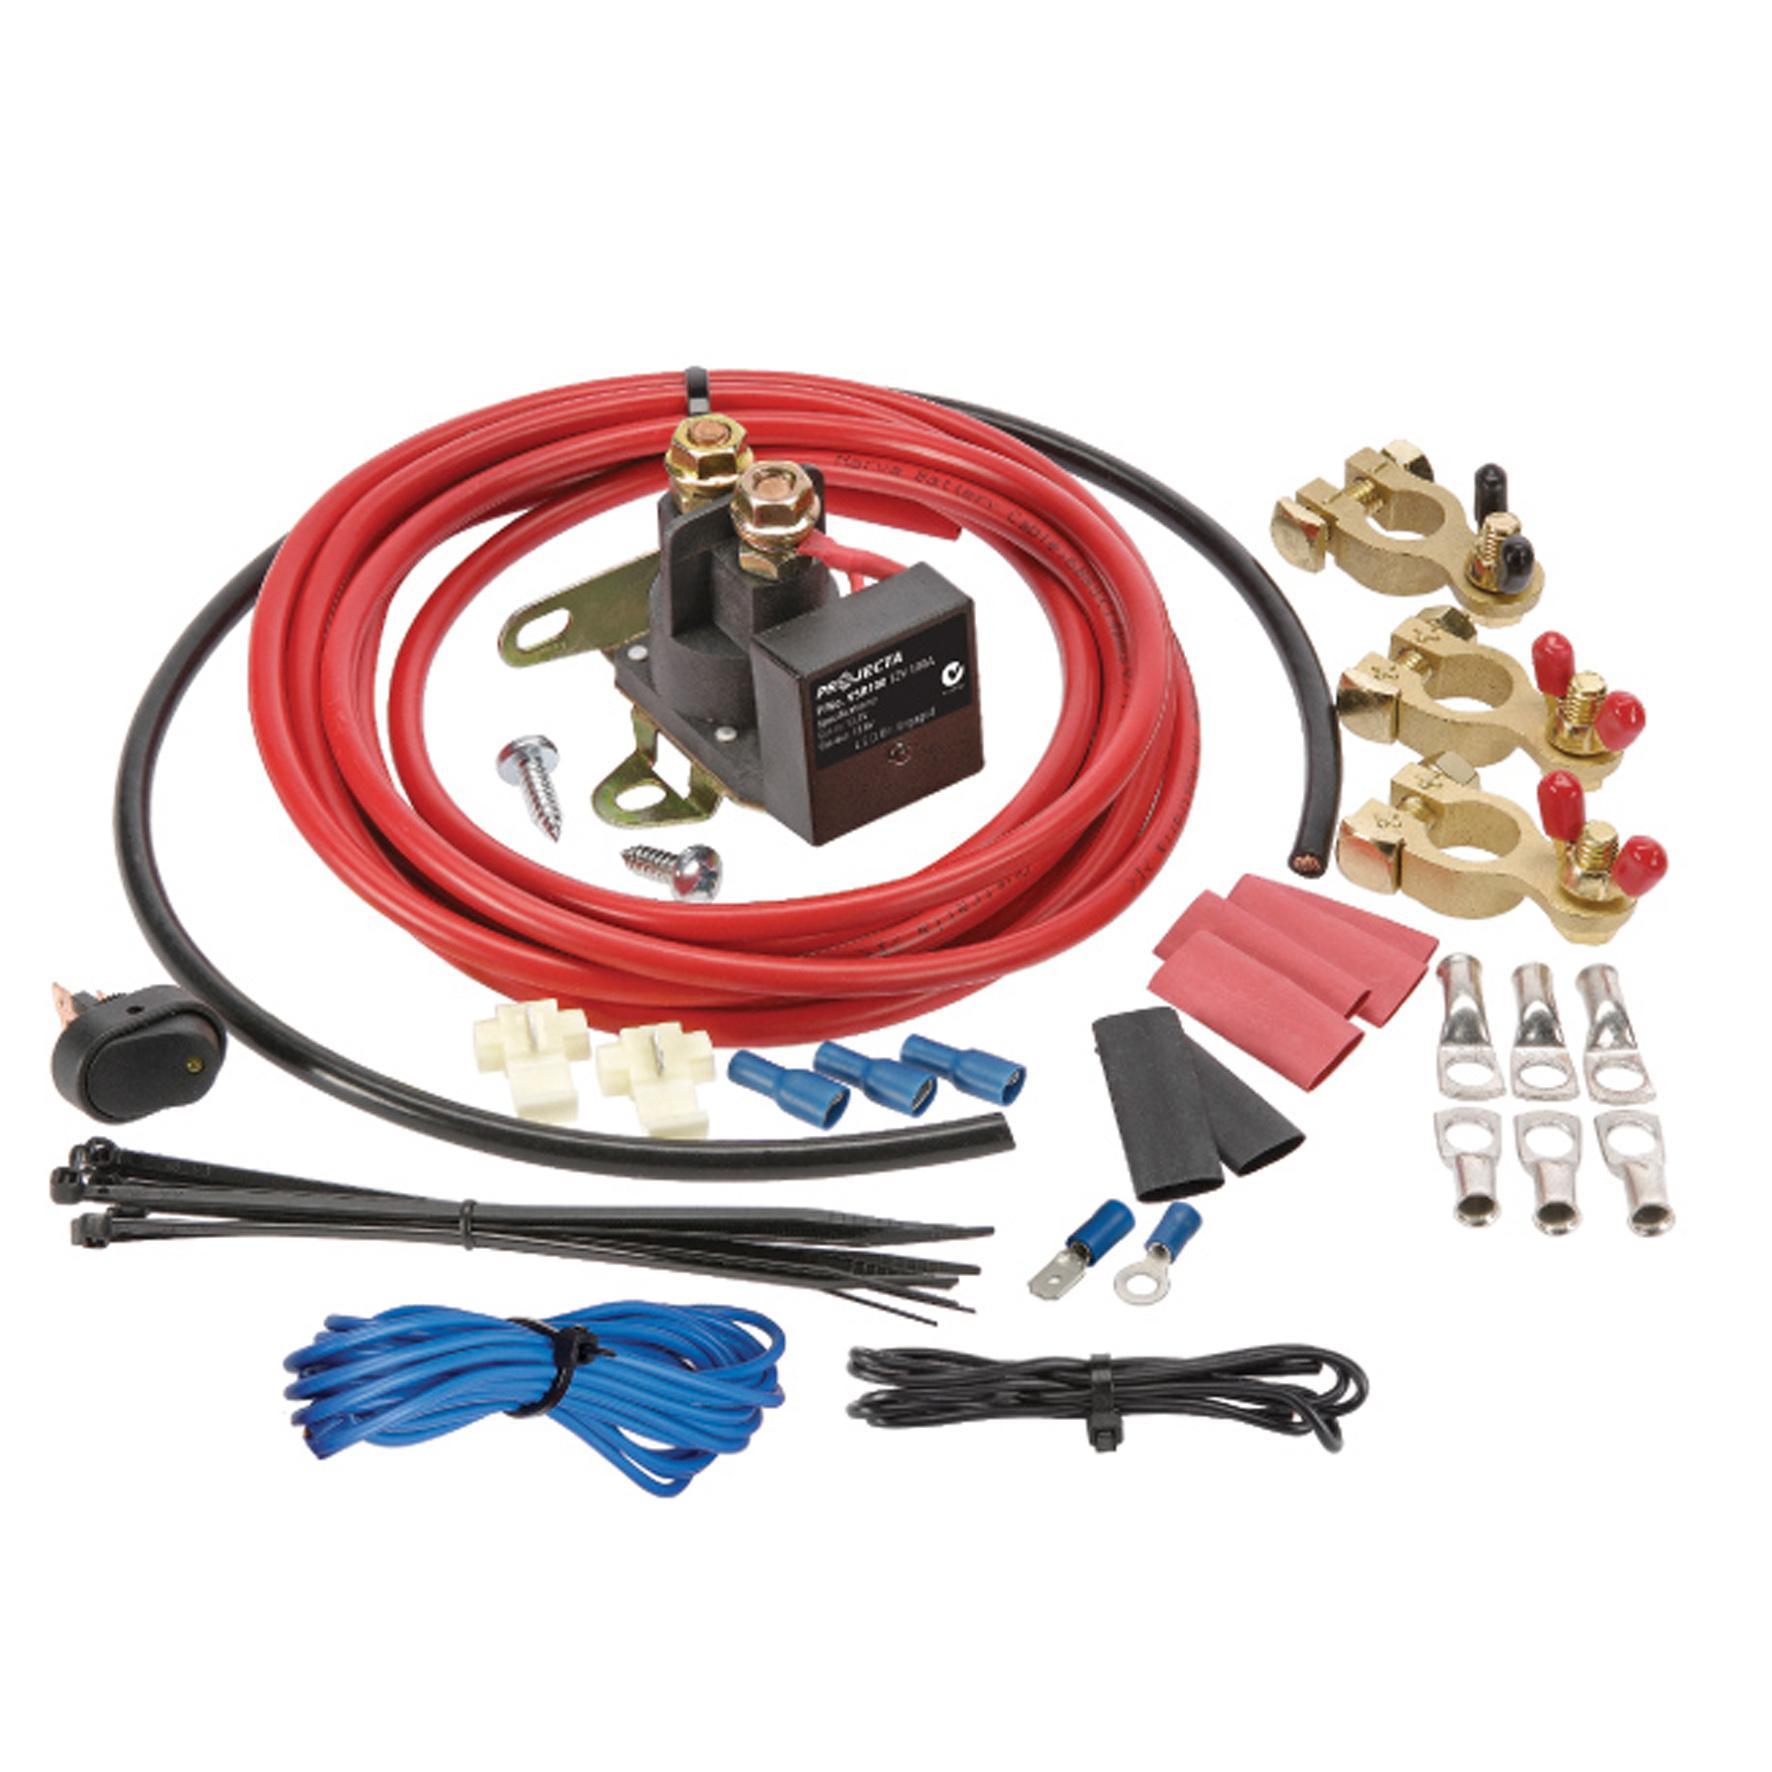 12v 100a Voltage Sensitive Relay Kit